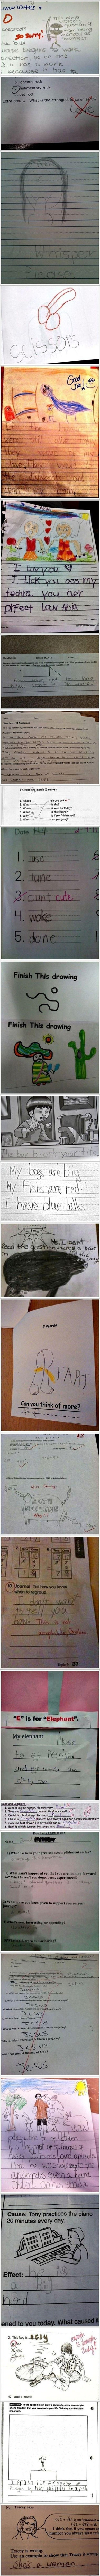 funny school work answers 30 pics